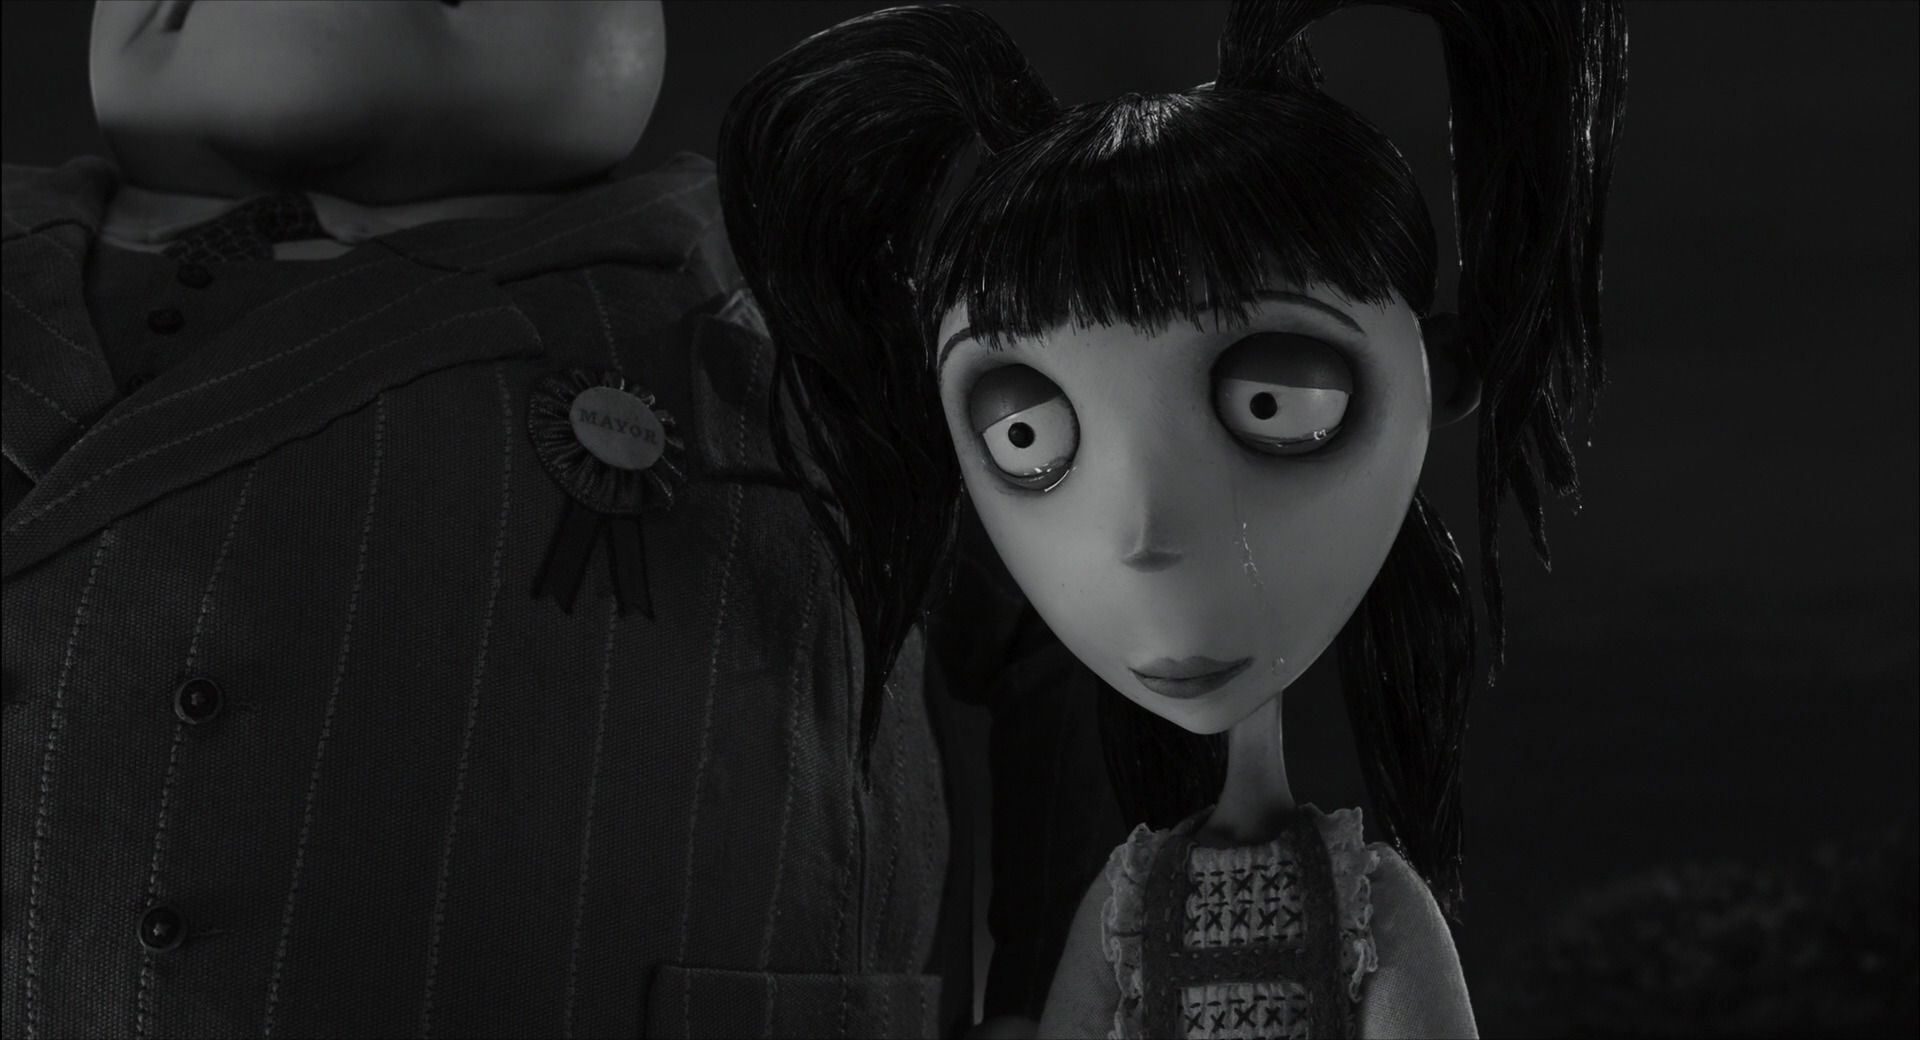 Frankenweenie 2012 Disney Screencaps Movie Monsters Tim Burton Anime Drawings